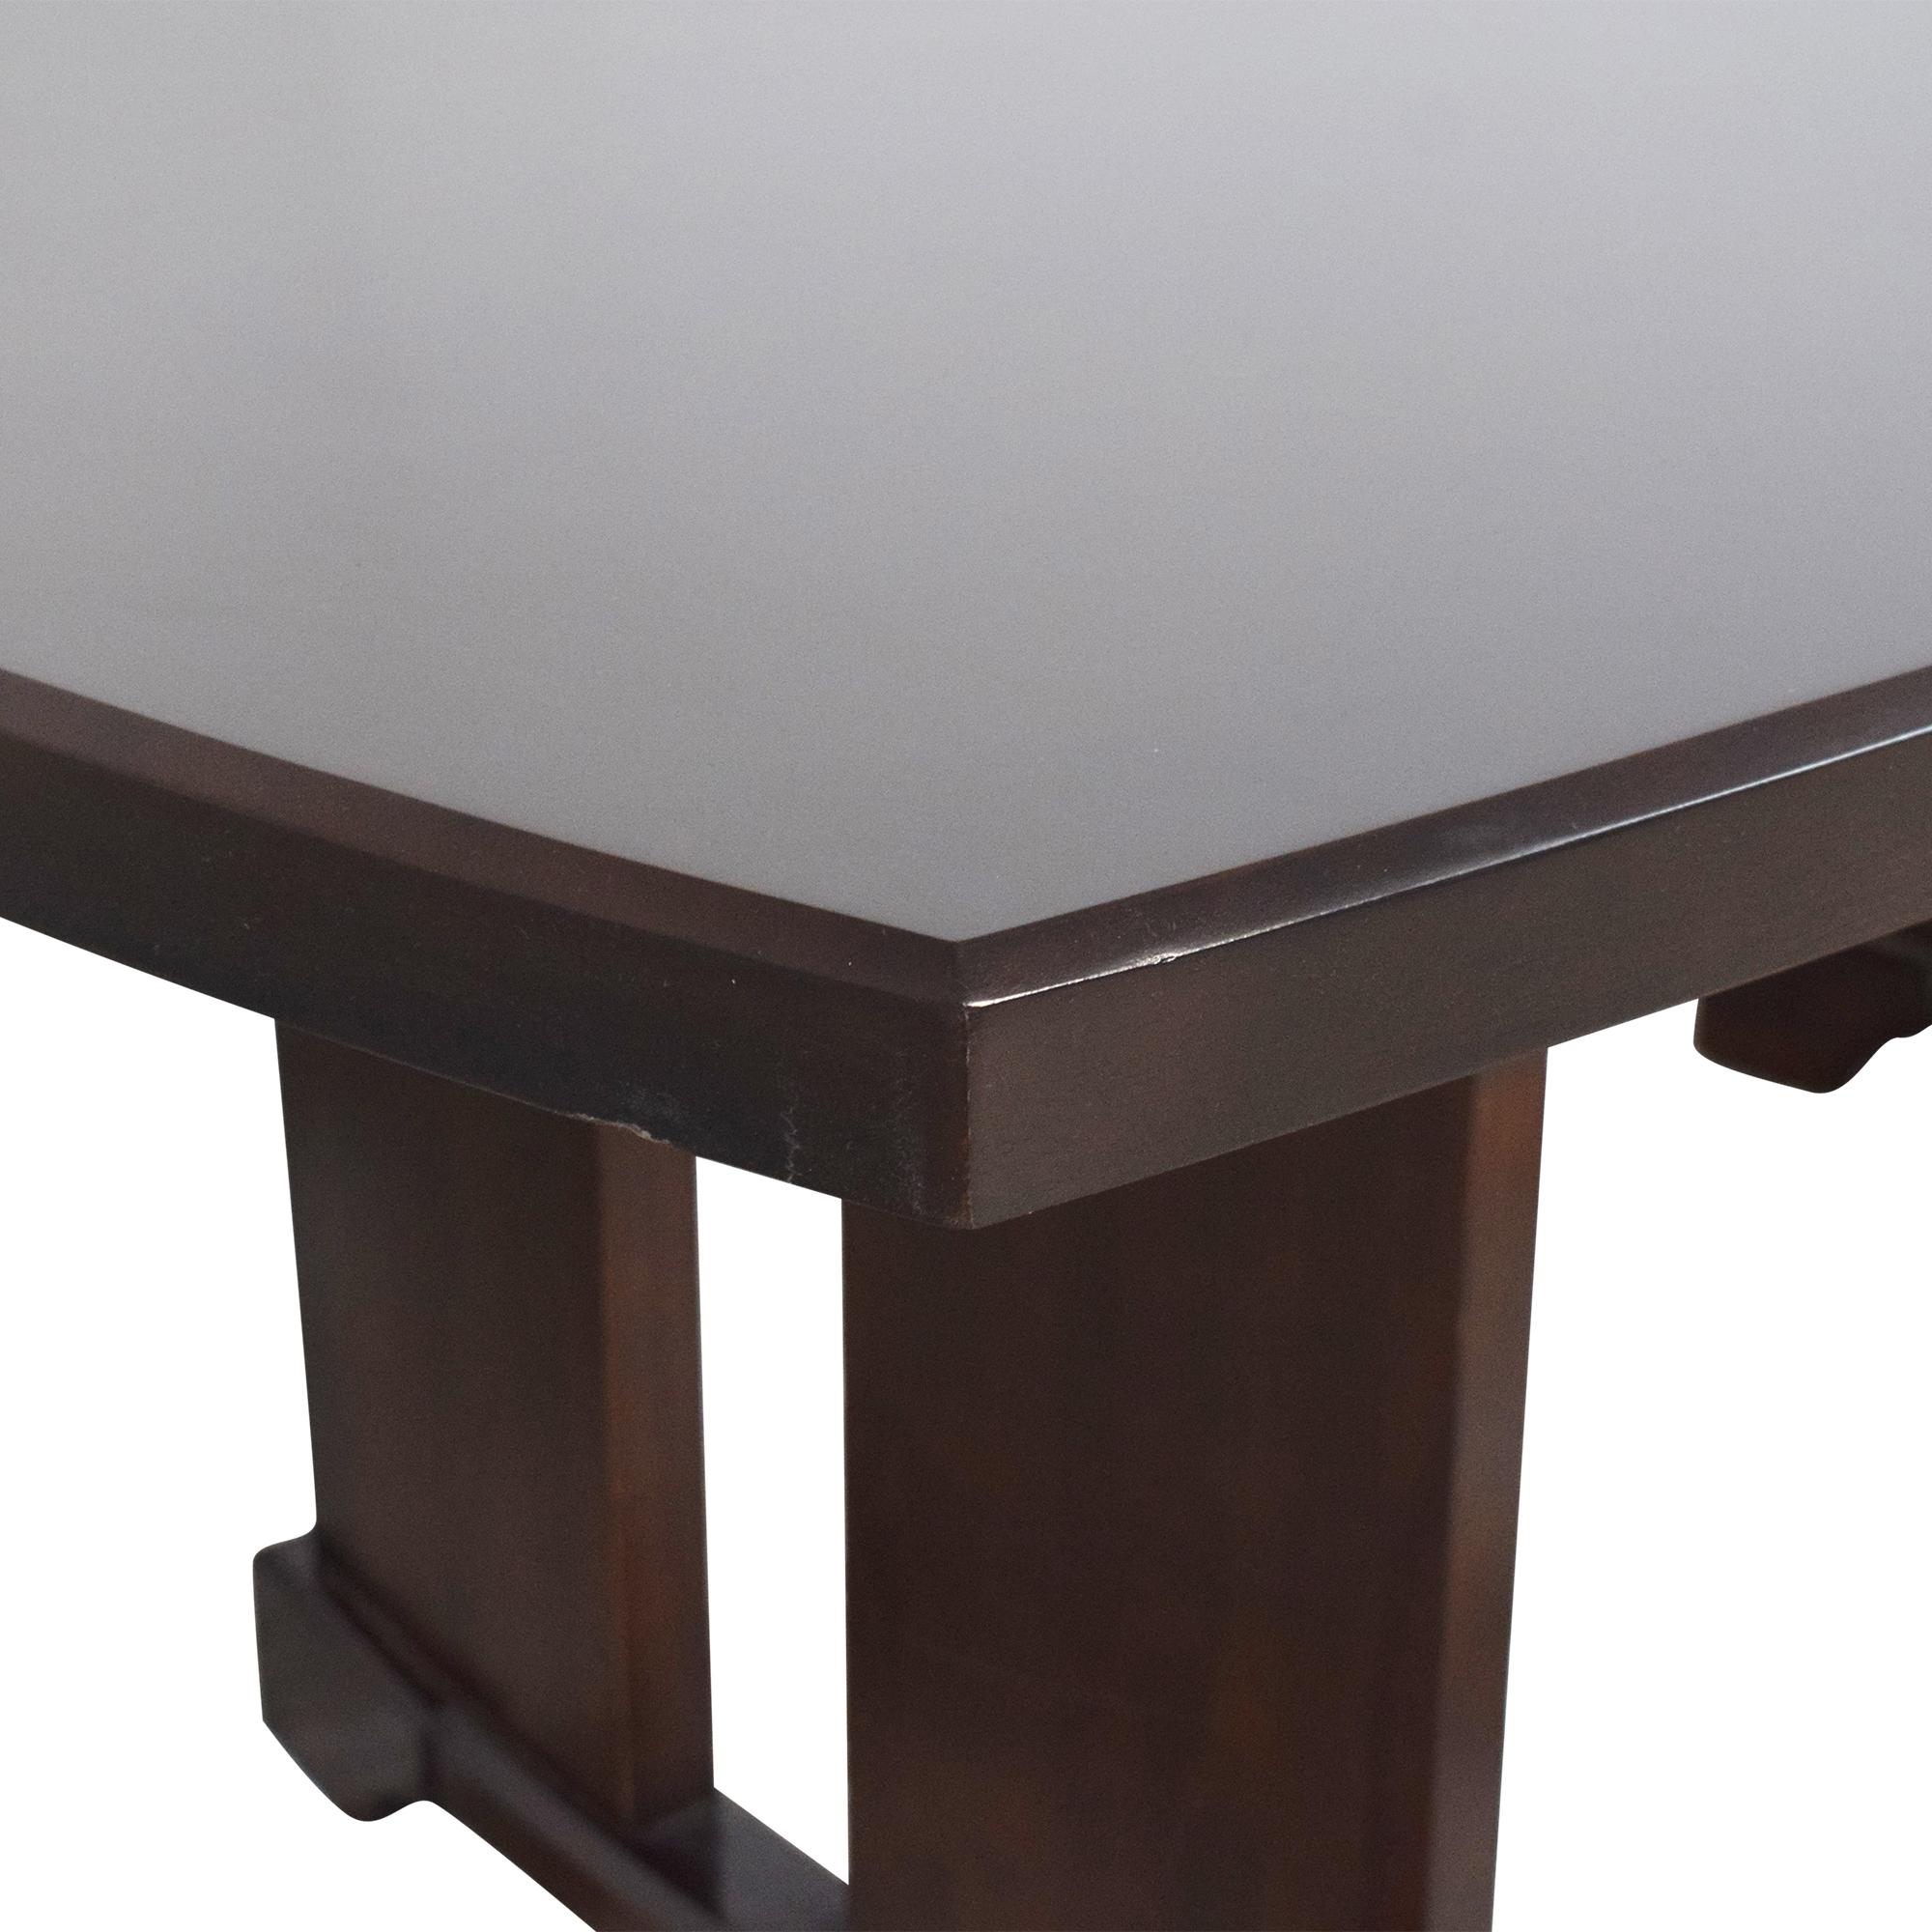 Casana Furniture Casana Extendable Dining Table pa